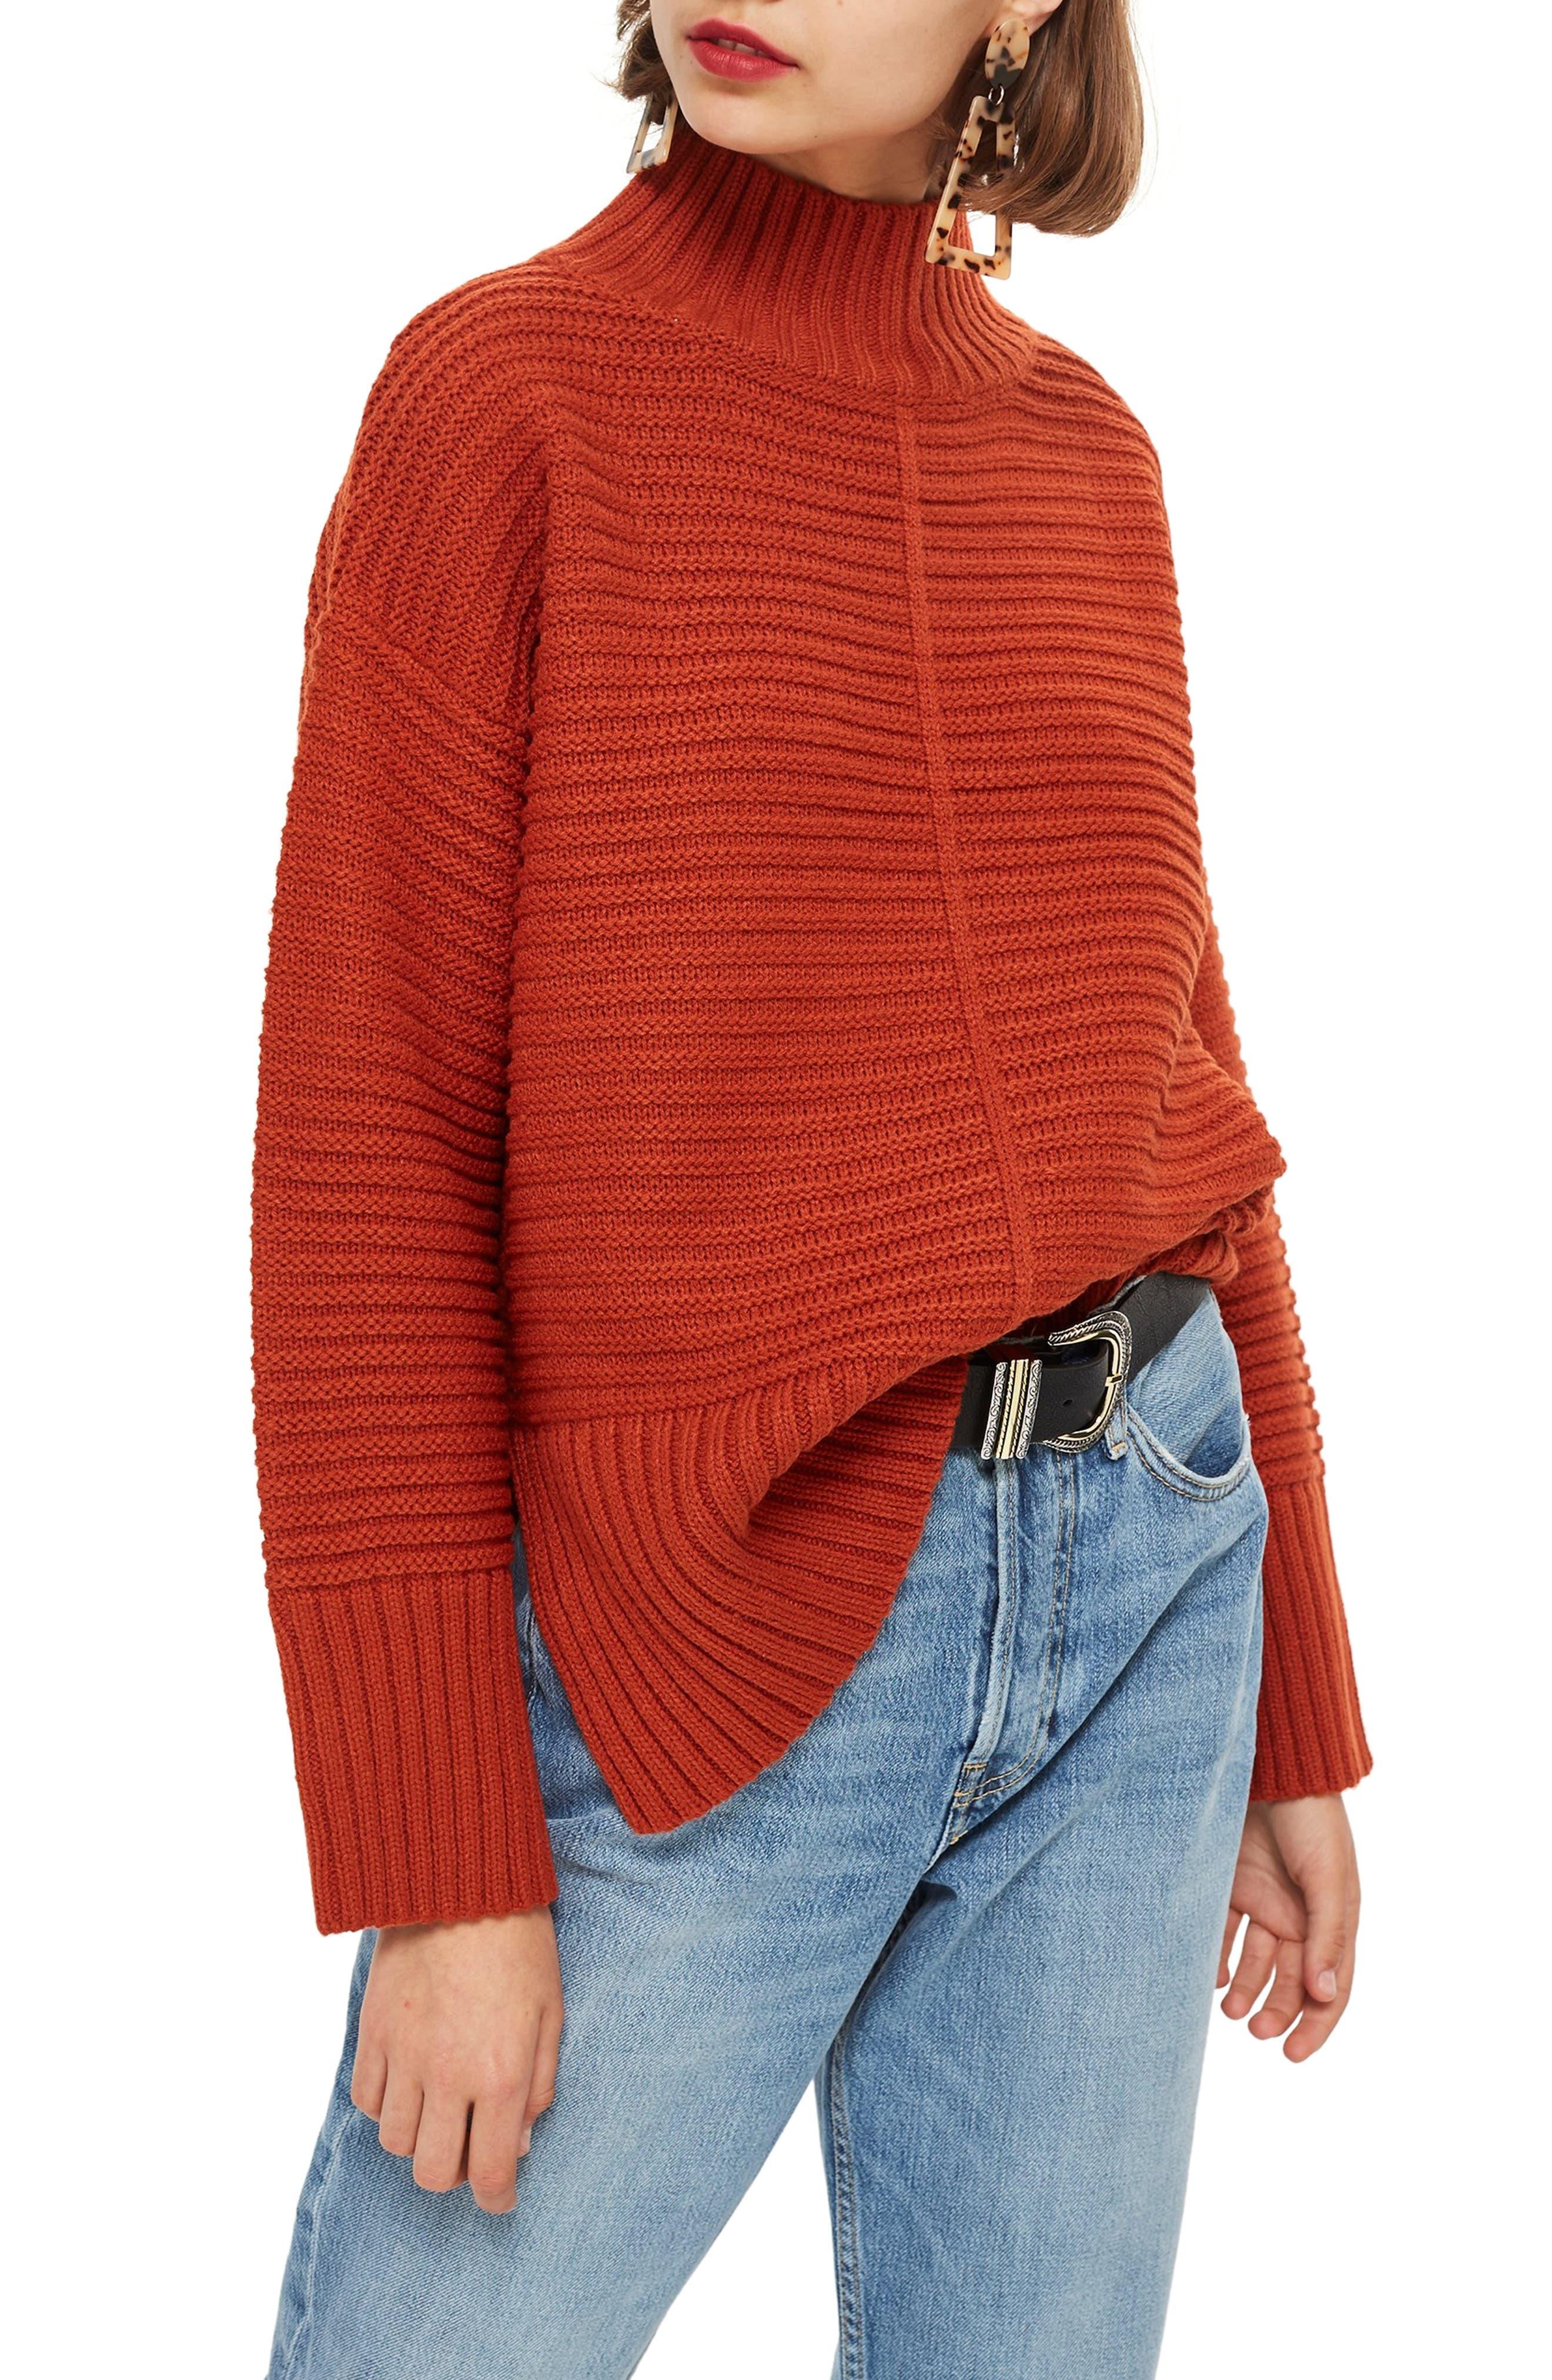 TOPSHOP, Mock Neck Sweater, Main thumbnail 1, color, RUST